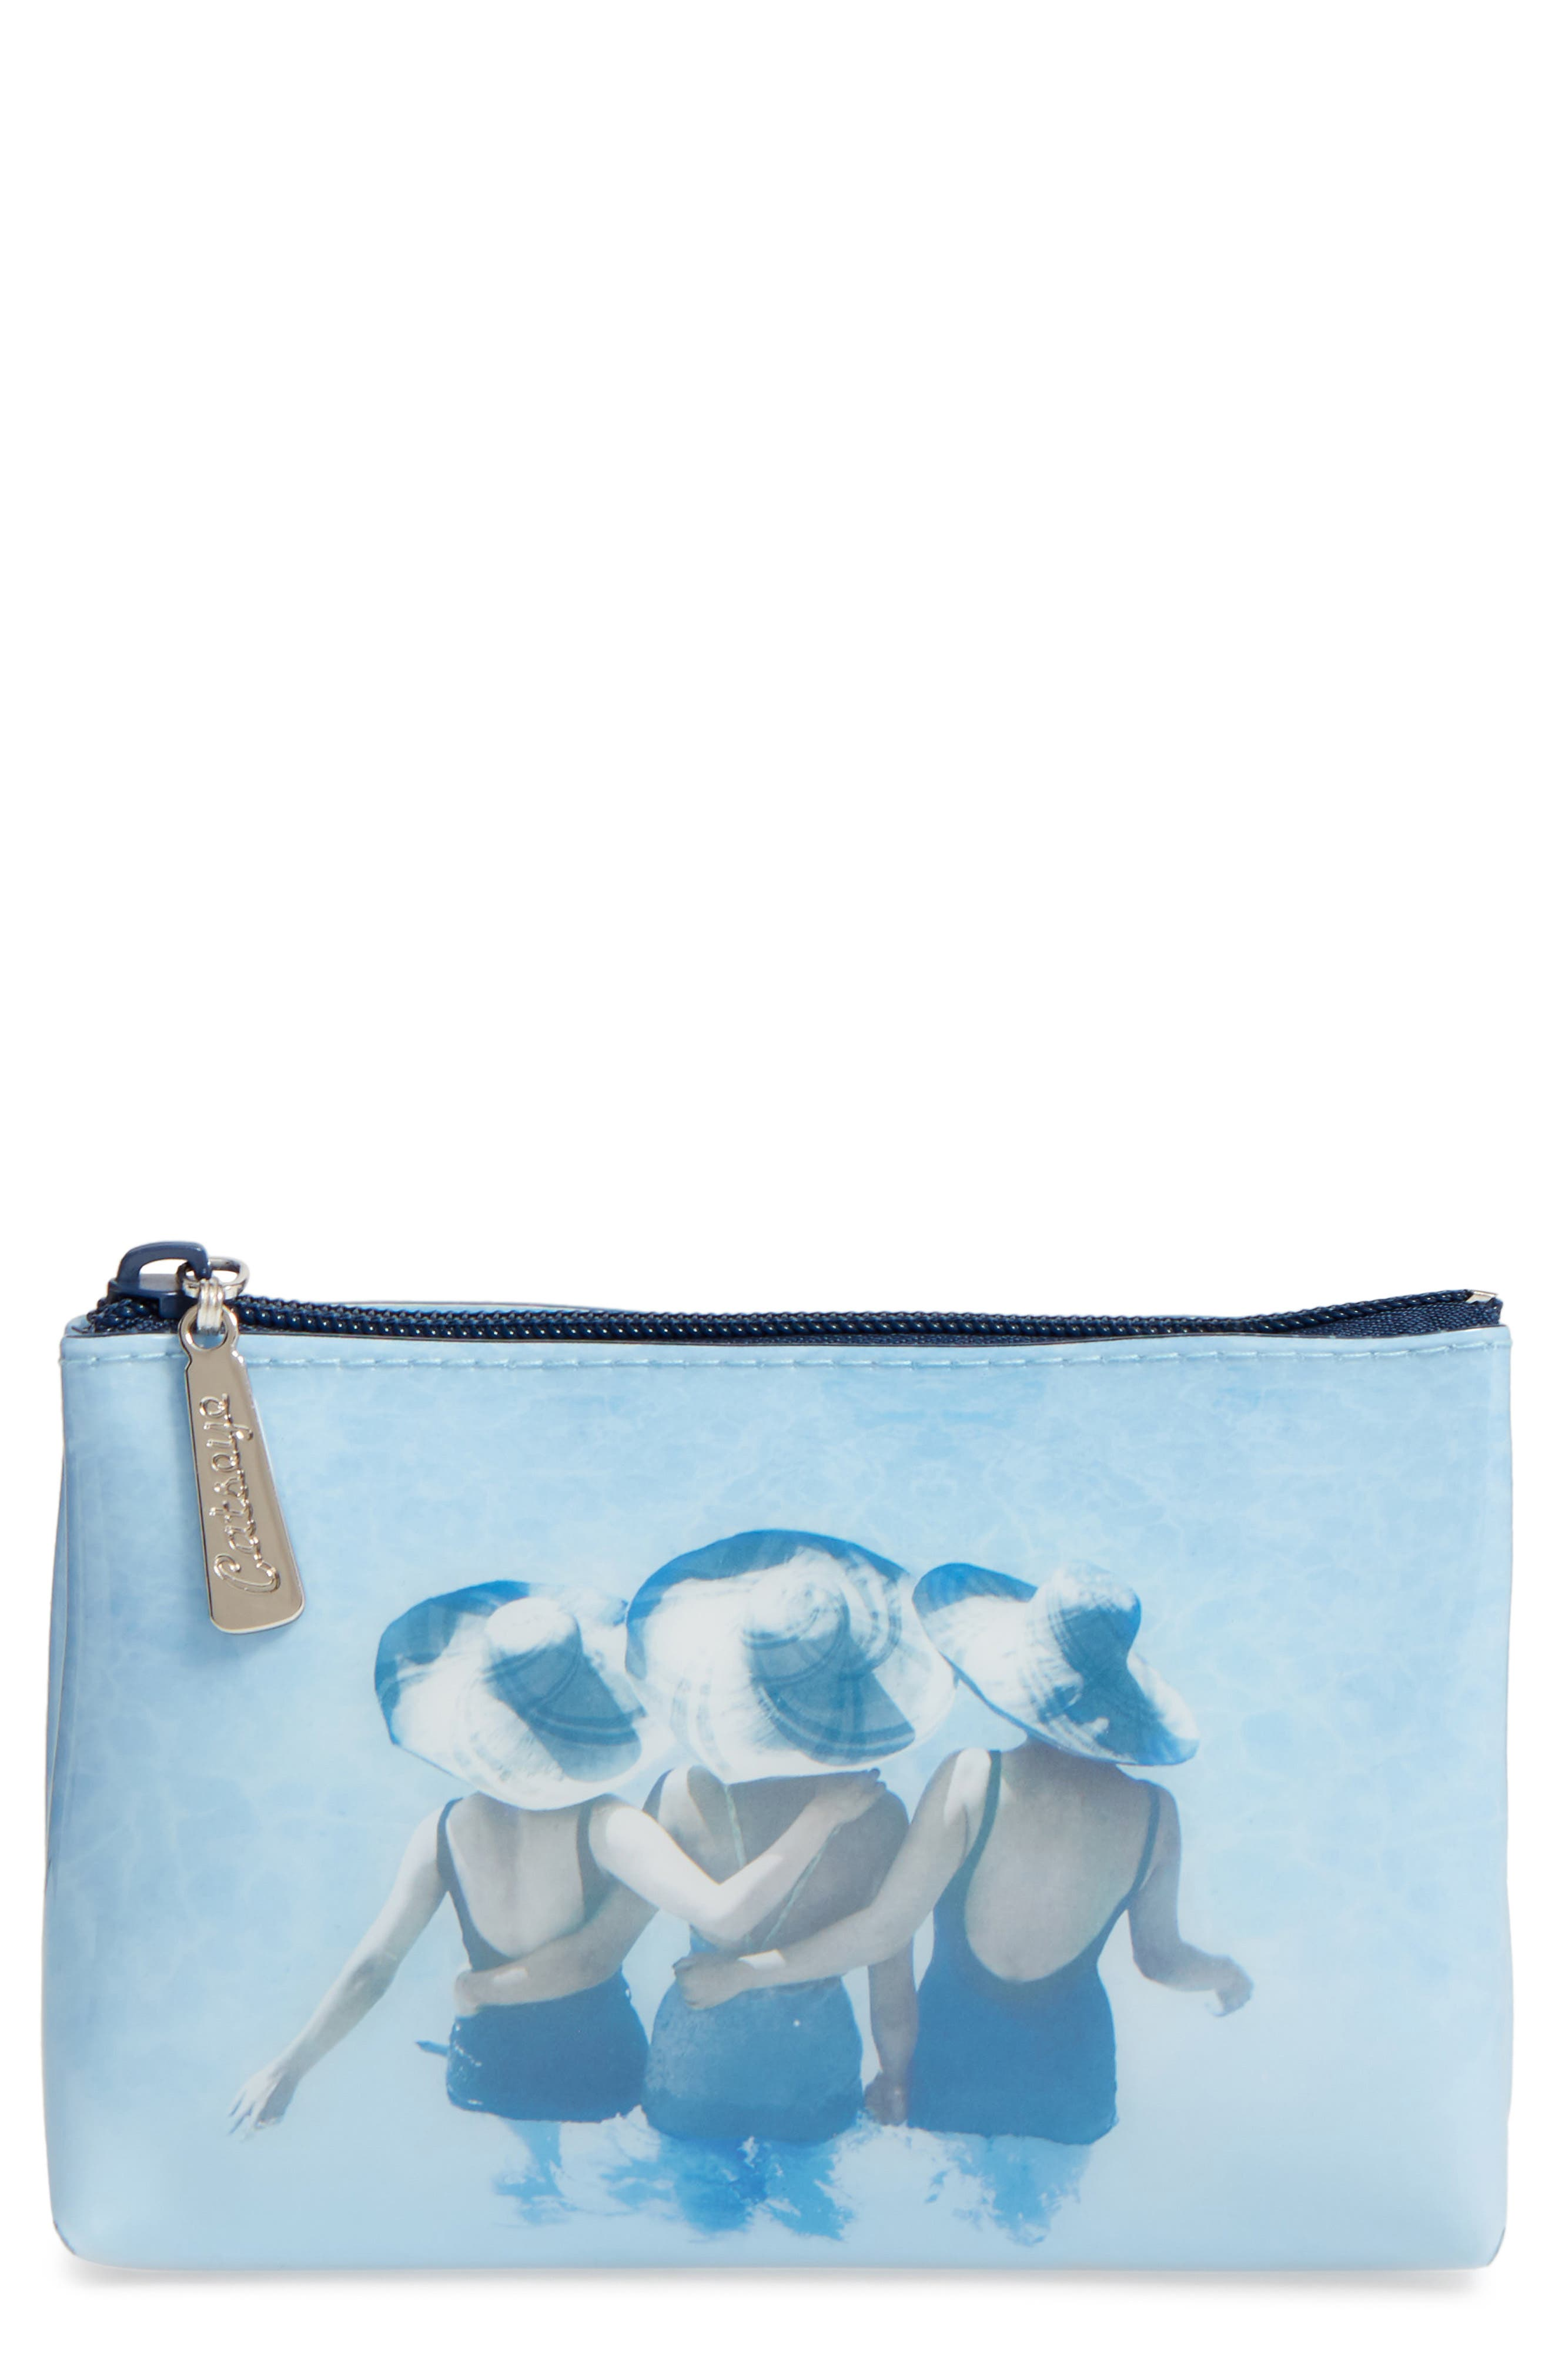 Beach Hats Zip Pouch,                             Main thumbnail 1, color,                             450